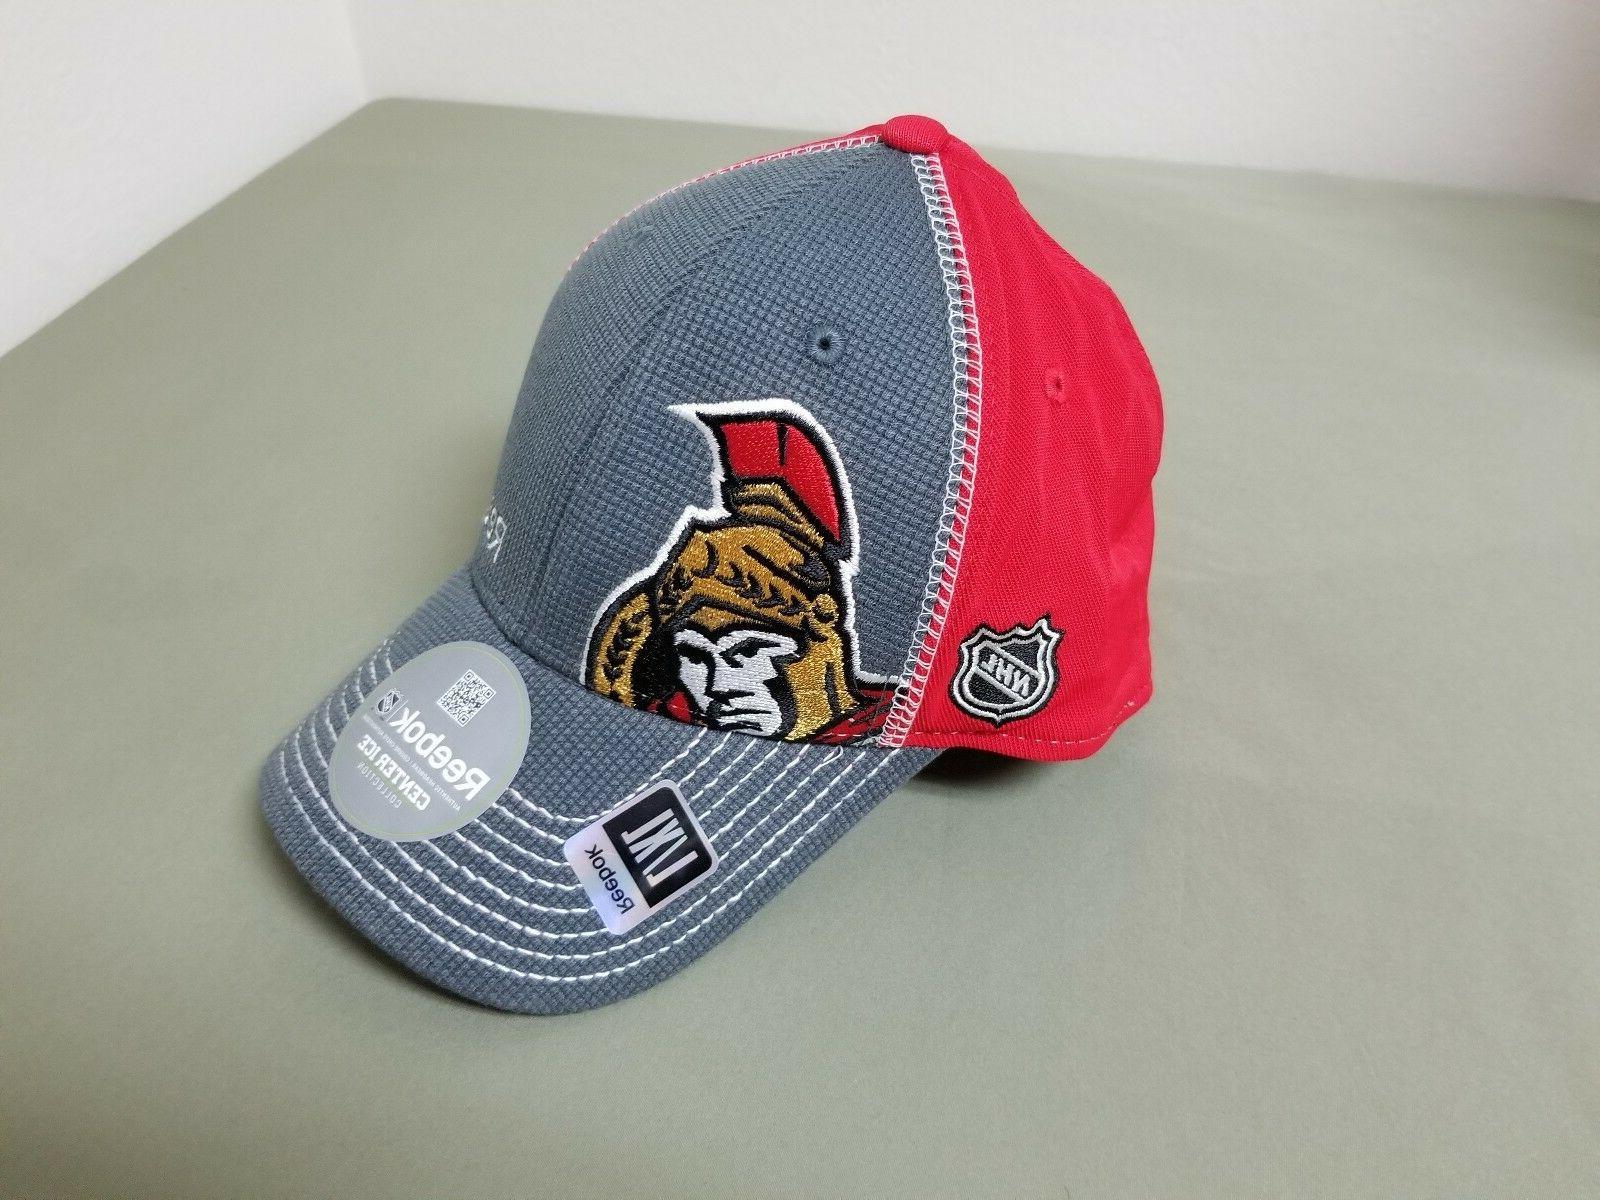 new nhl reebok ottawa senators baseball cap